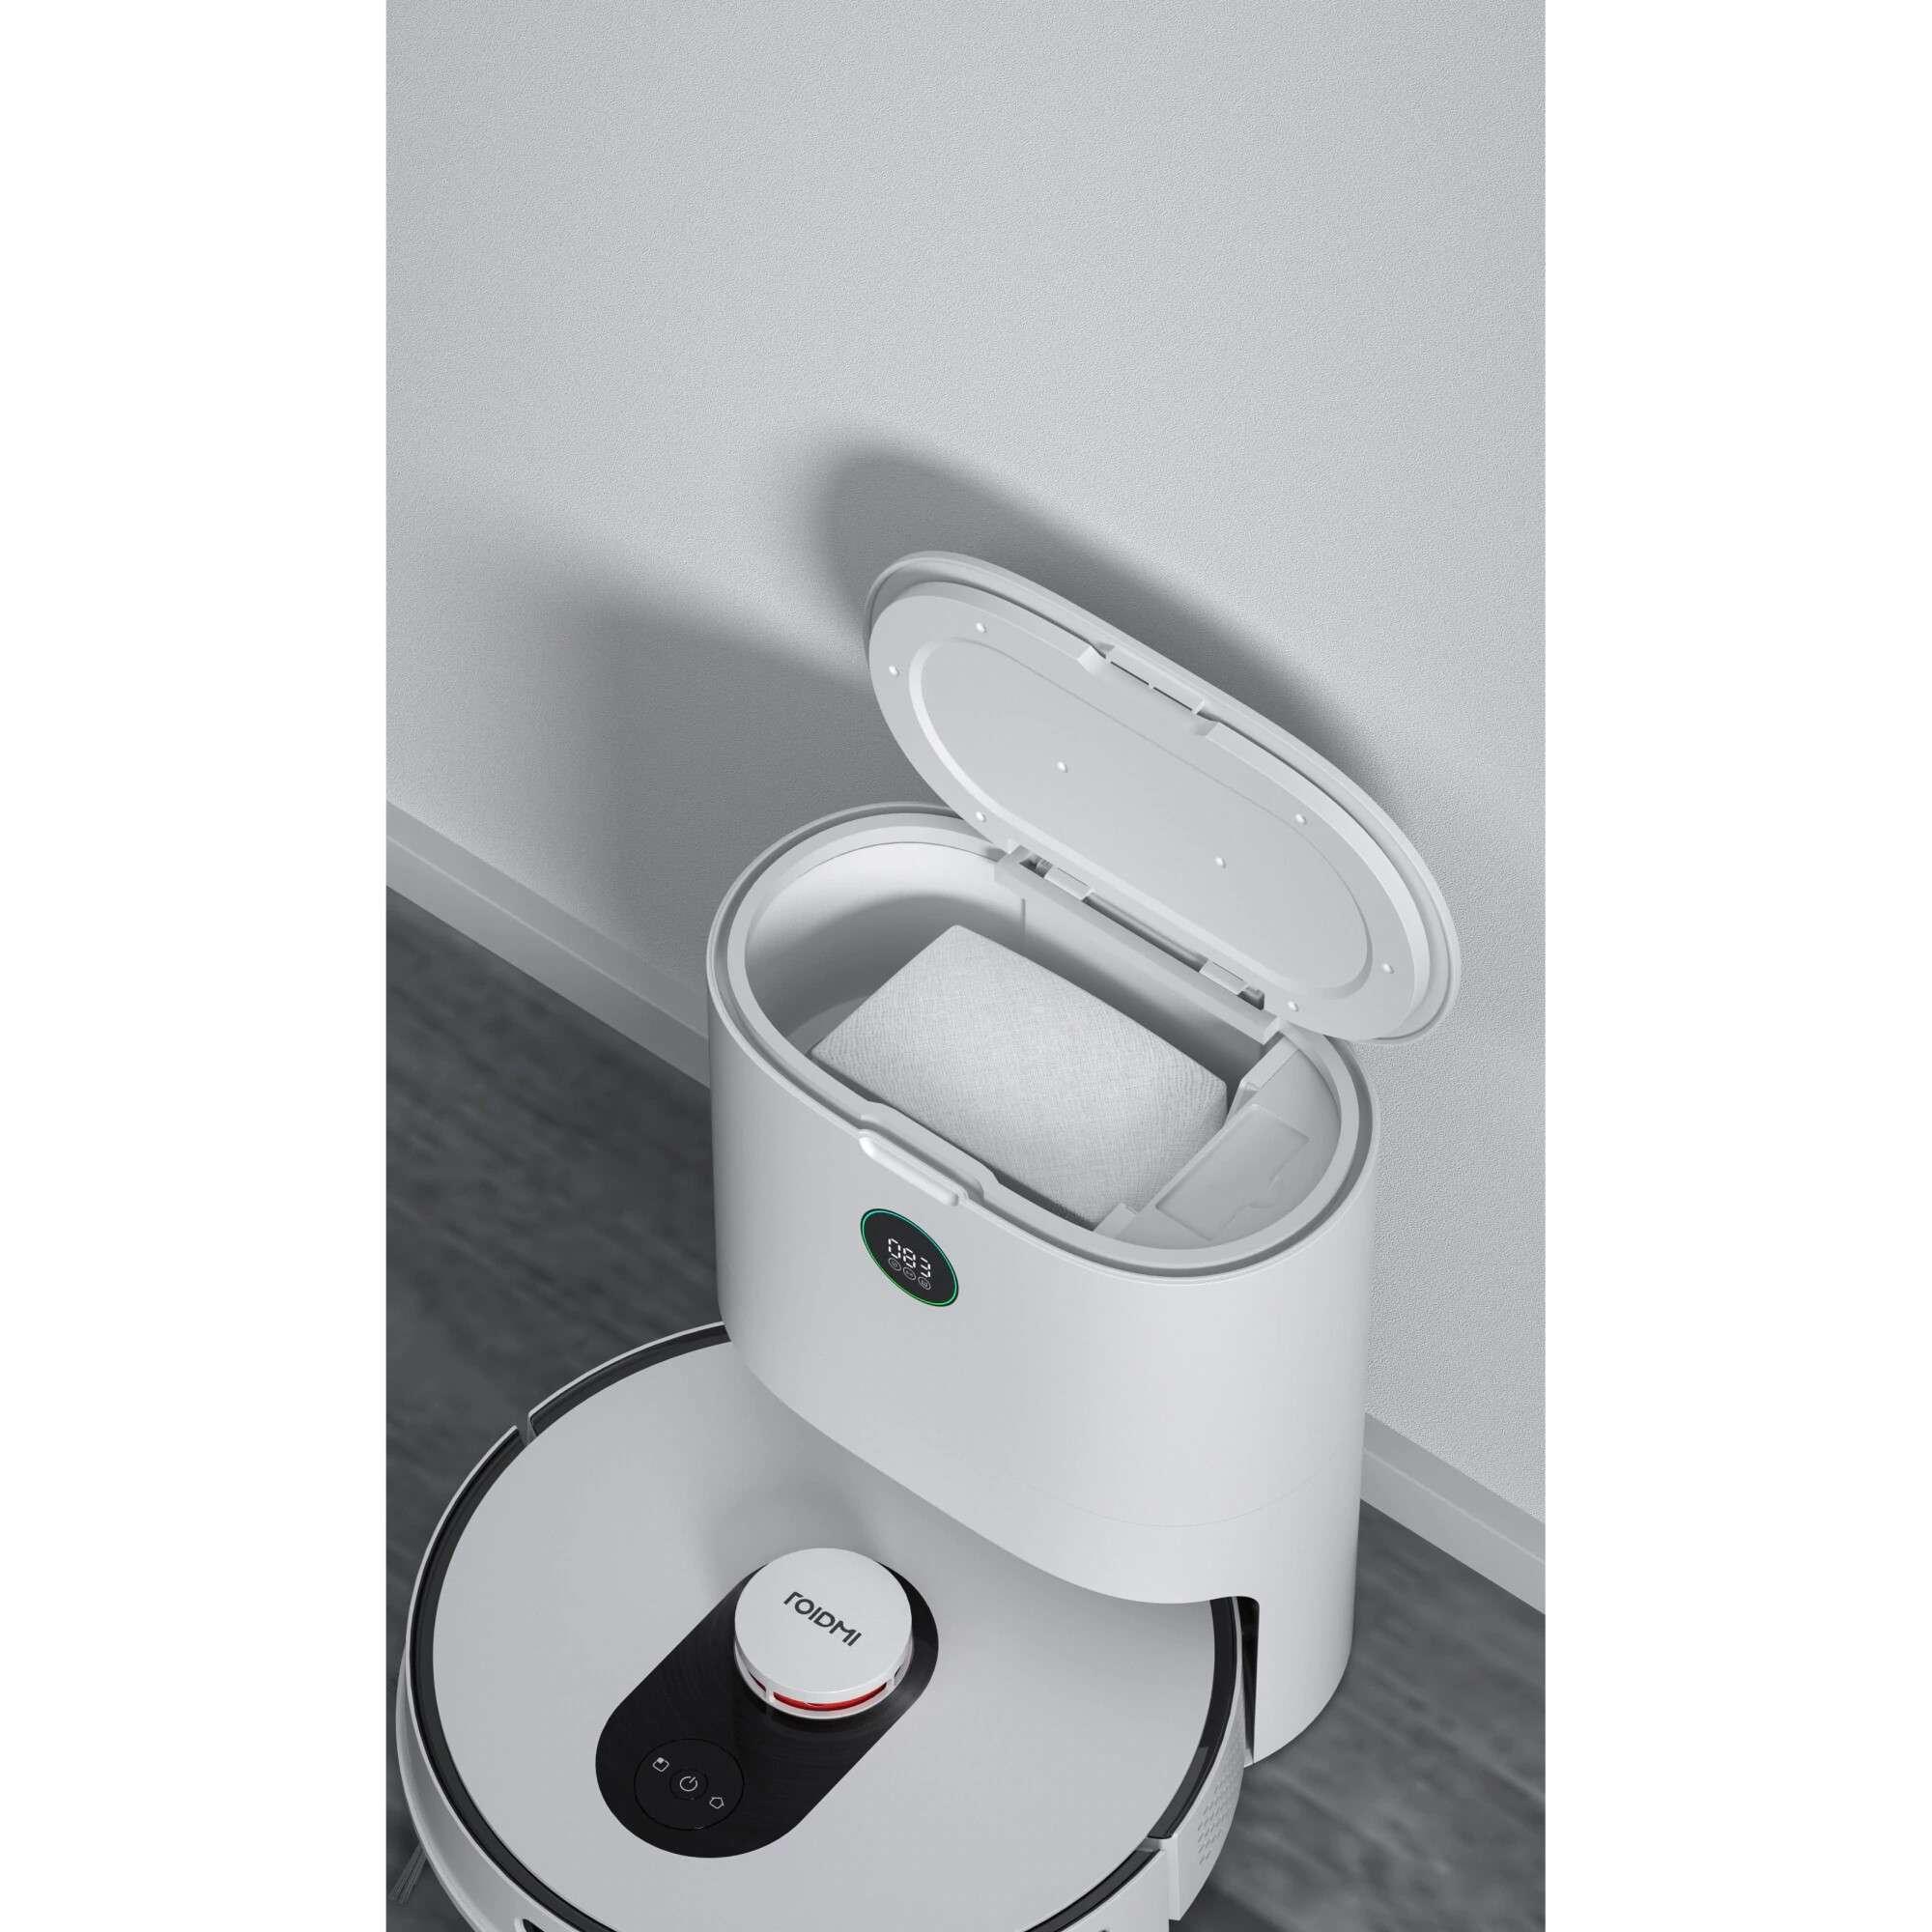 Robot de aspirare Roidmi Robot EVE Plus, Mop, 50W, 5200mAh, Putere de absorbtie 2700Pa, Colectare praf 3l, Alb 5